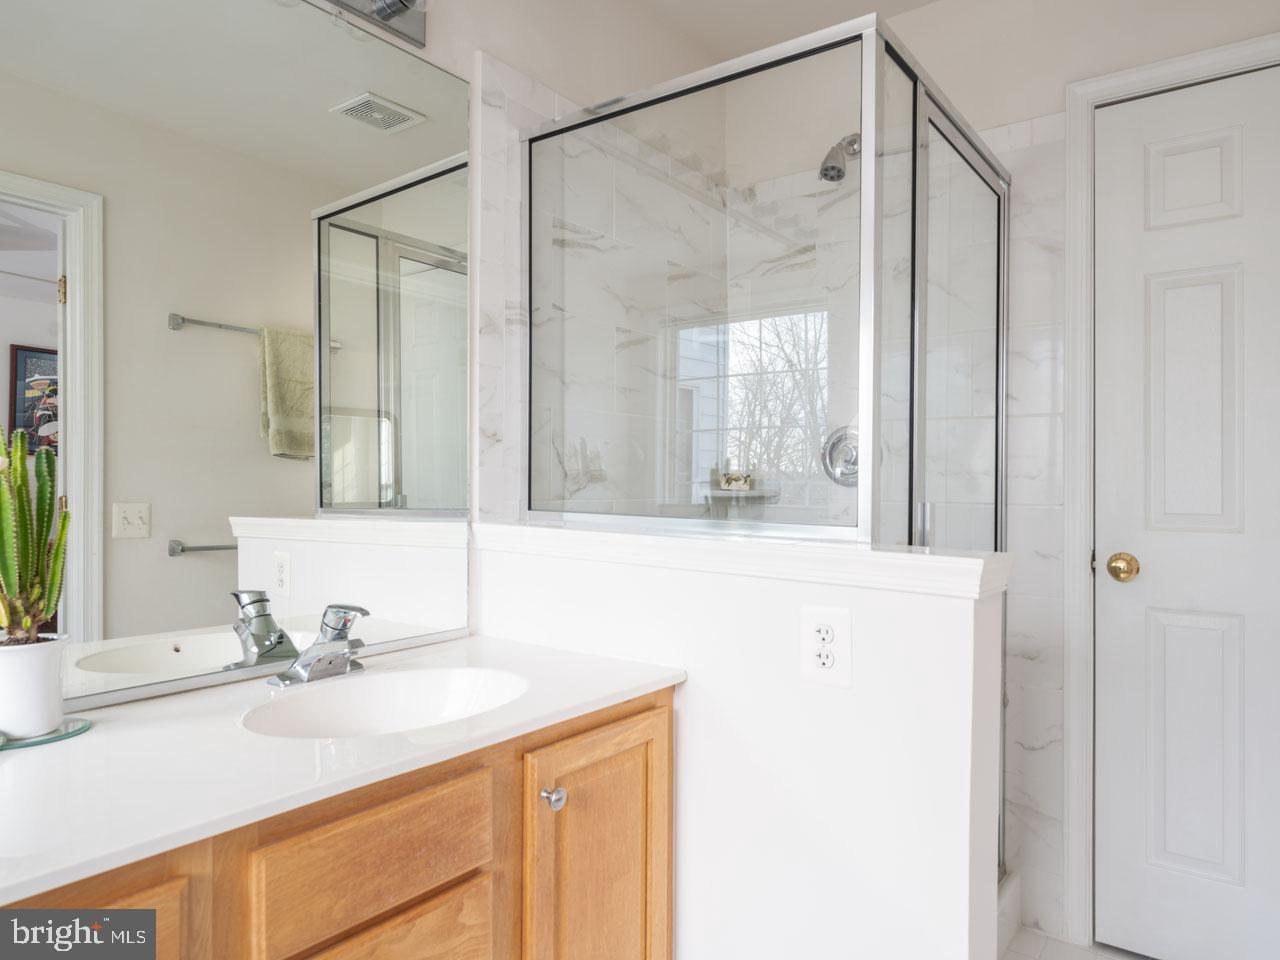 VAFX1104336-302201656841-2021-07-16-19-45-23  |   | Alexandria Delaware Real Estate For Sale | MLS# Vafx1104336  - Best of Northern Virginia